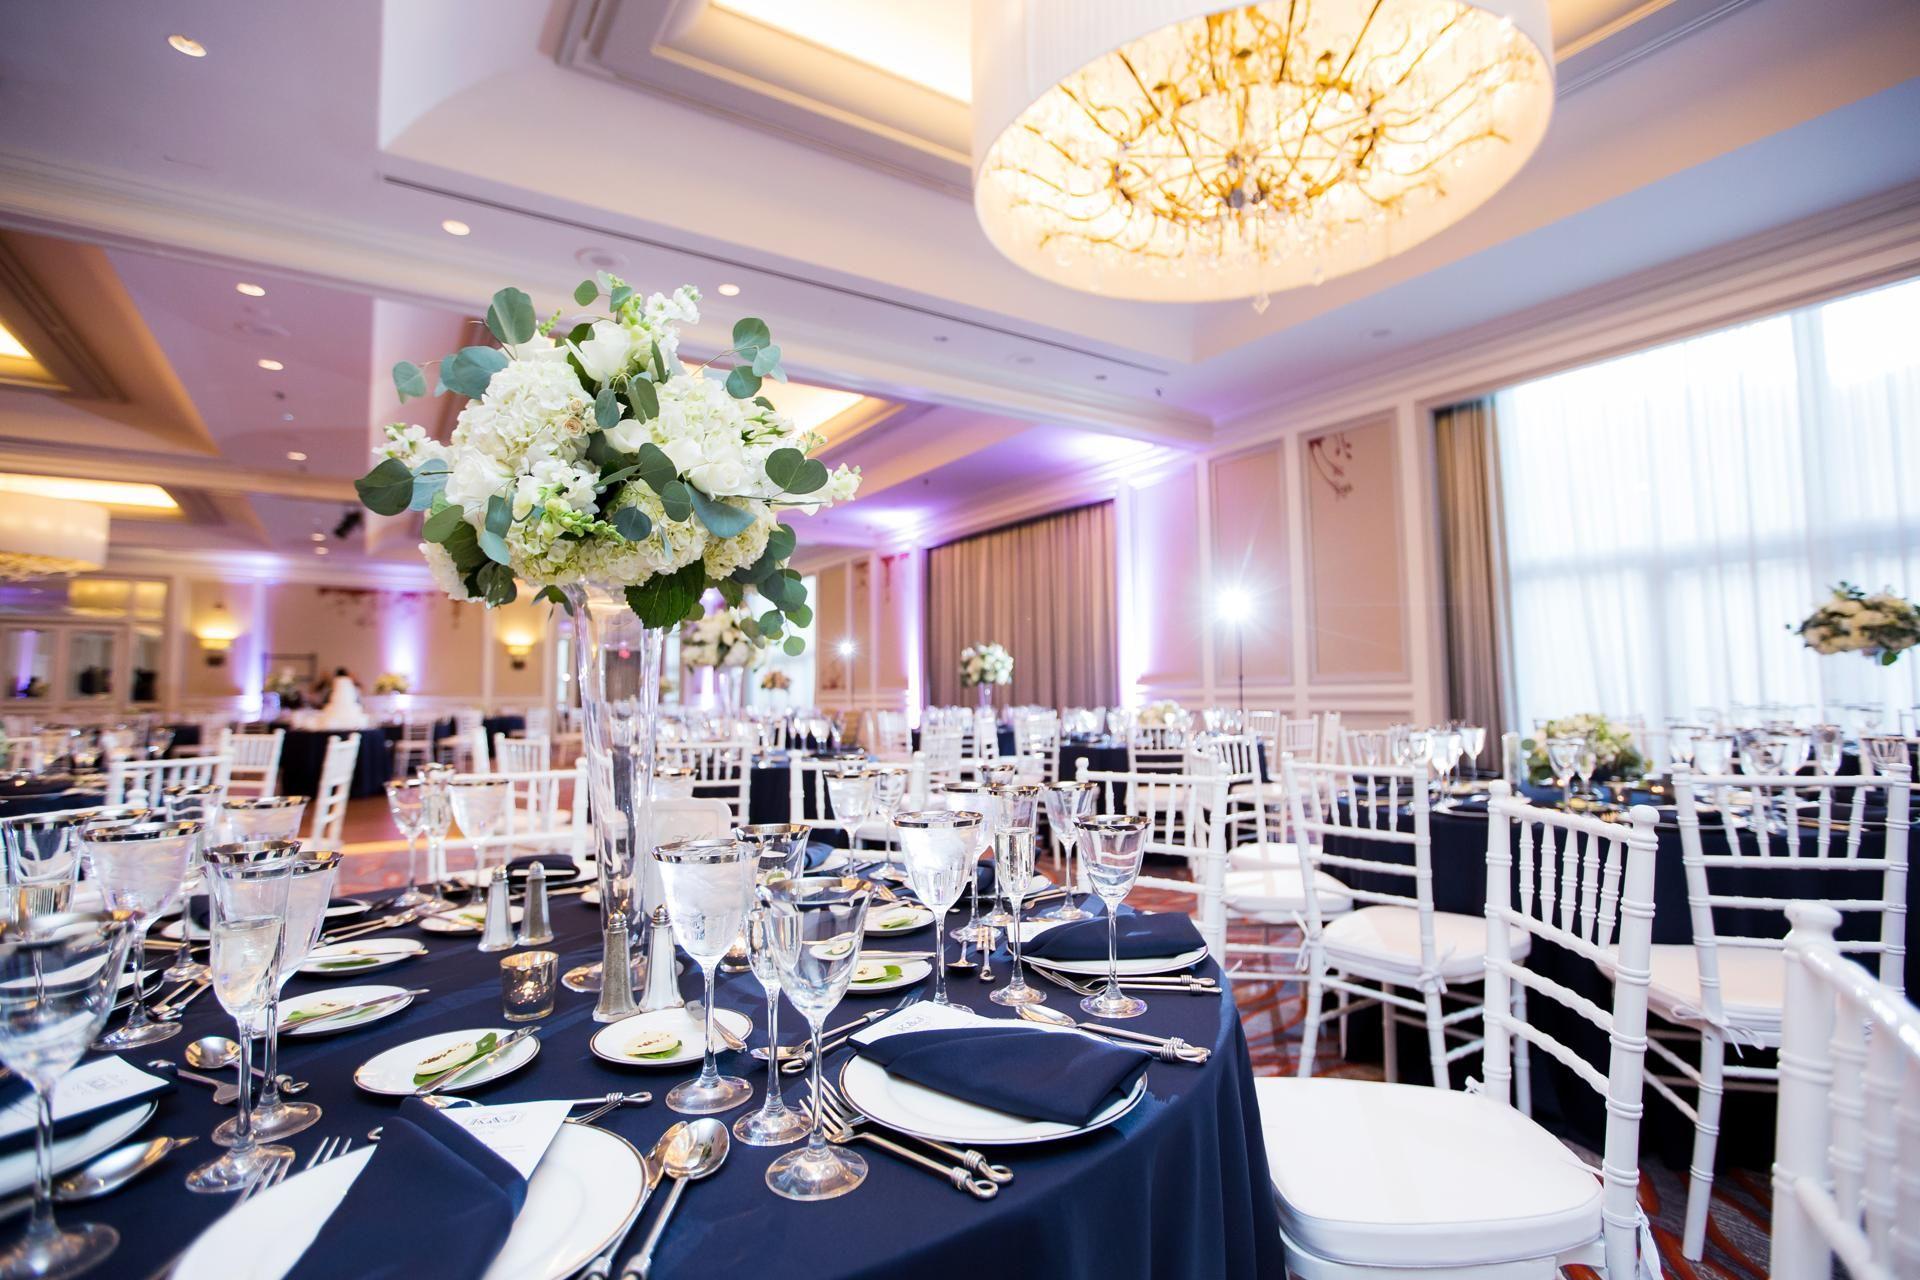 New England Country Rentals White Flower Centerpieces Wedding Boston Marathon Bombing